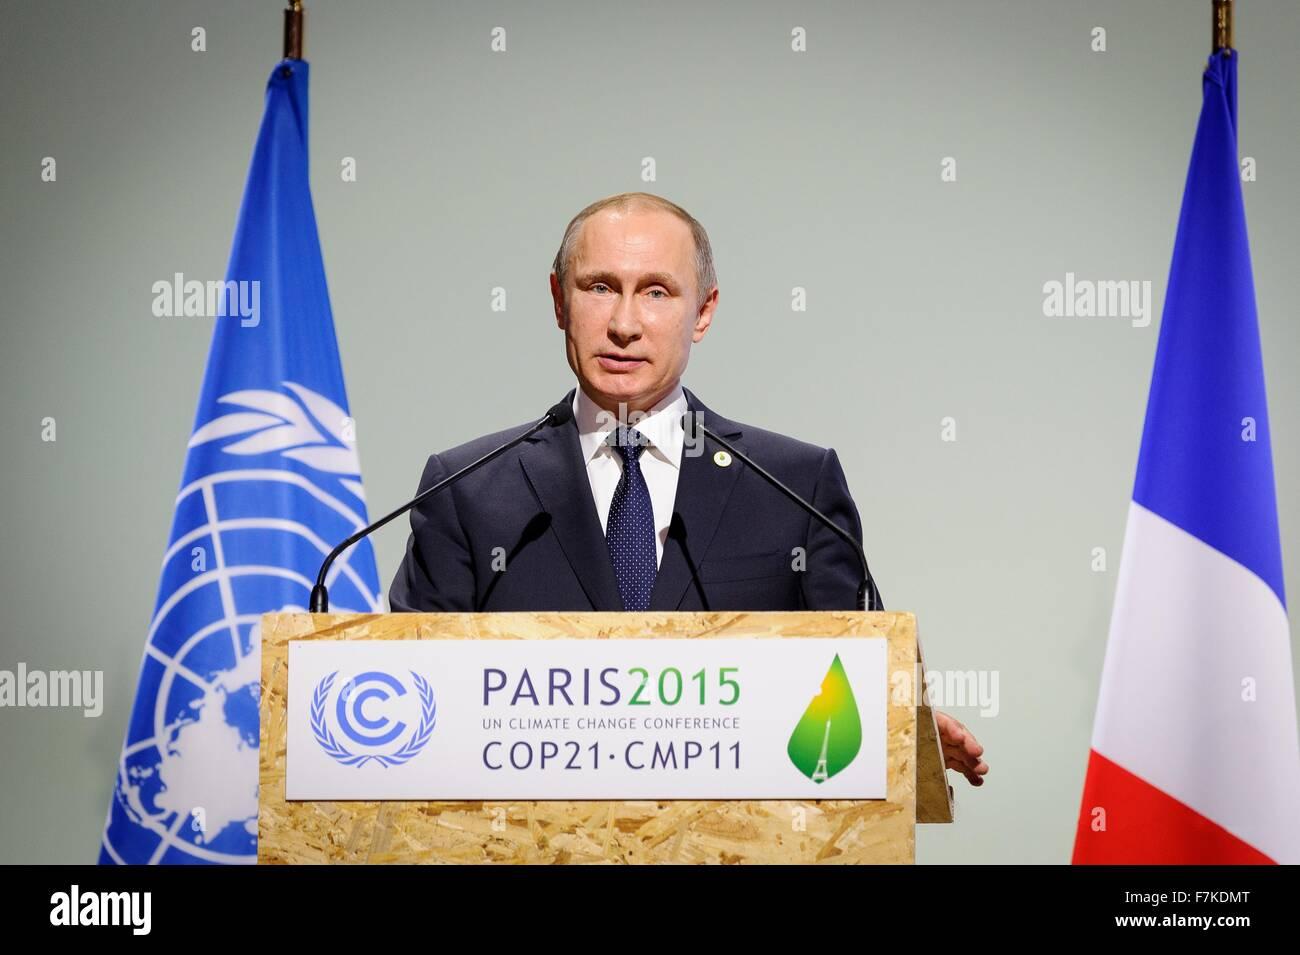 Le Bourget, France. 30th November, 2015. Russian President Vladimir Putin addresses the opening plenary session - Stock Image